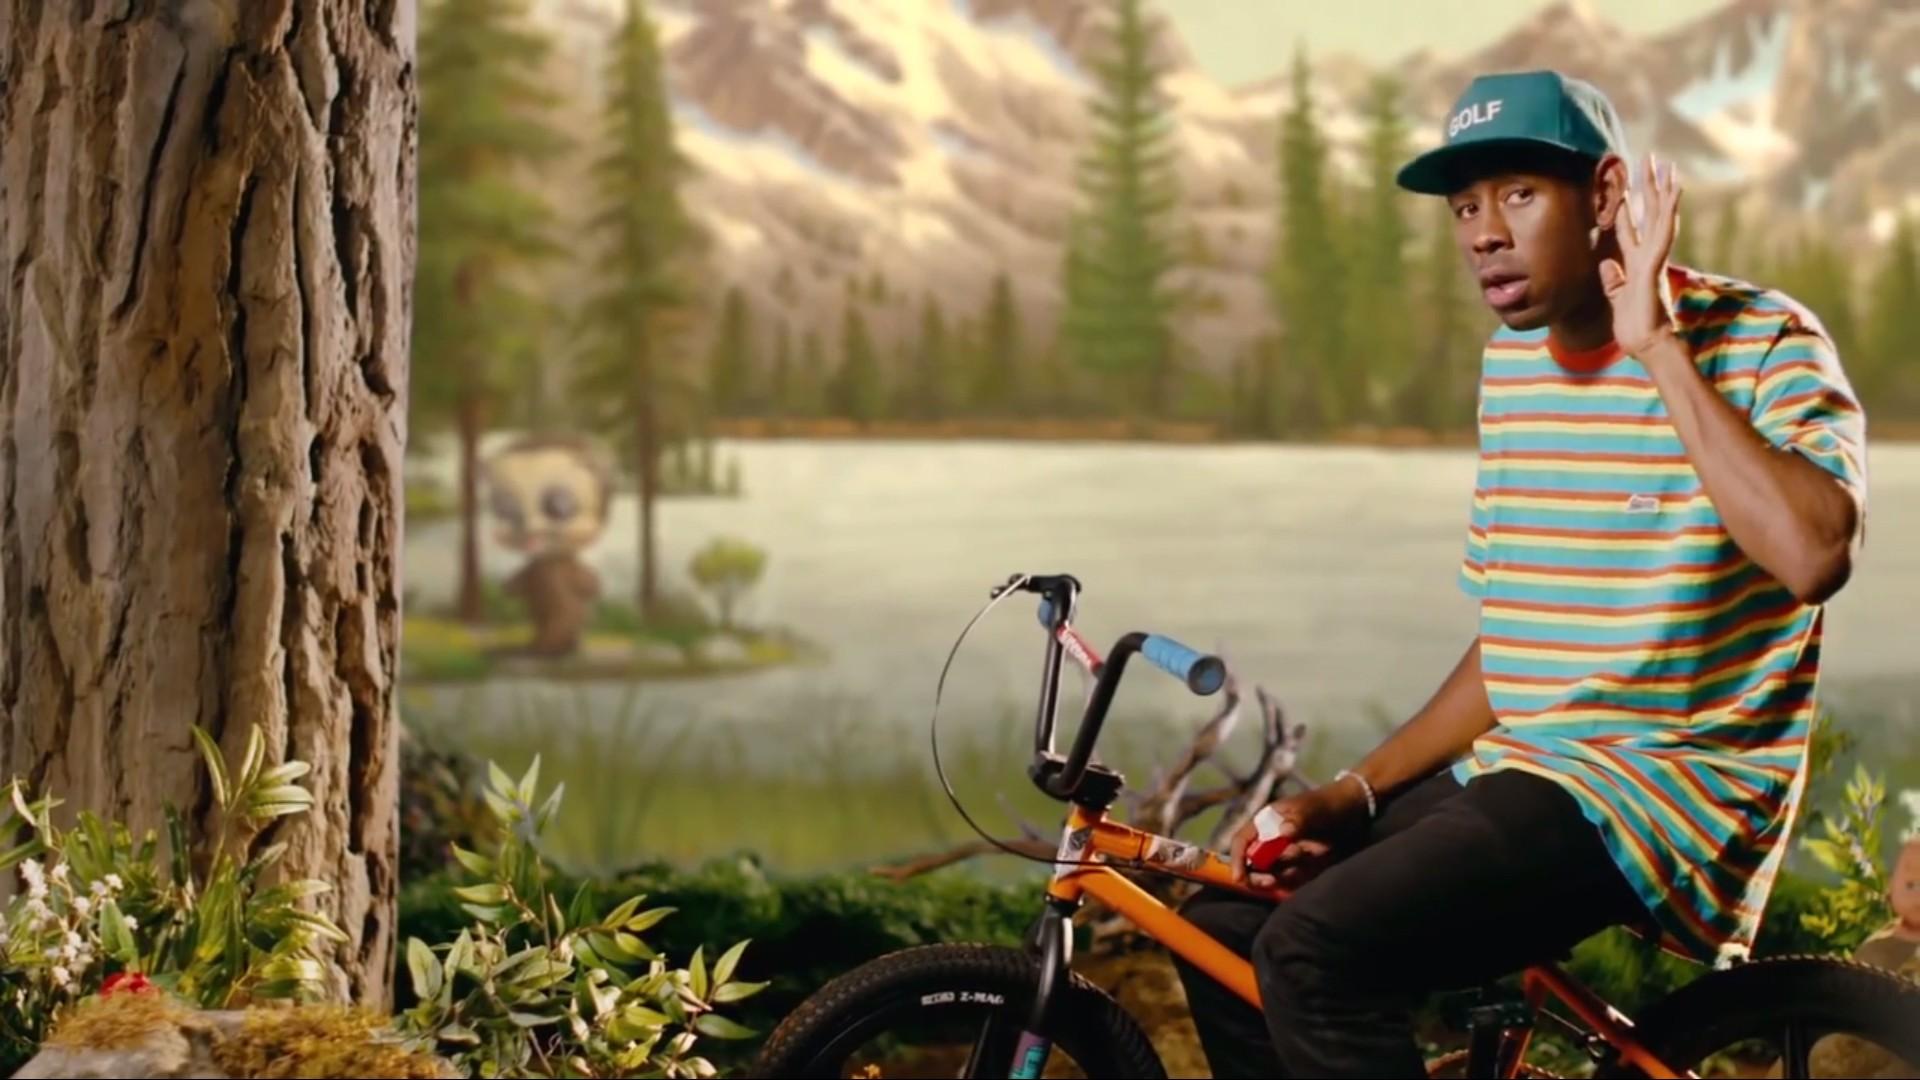 Golf Wang Wallpaper Iphone Tyler The Creator Wallpaper 183 ① Download Free Beautiful Hd